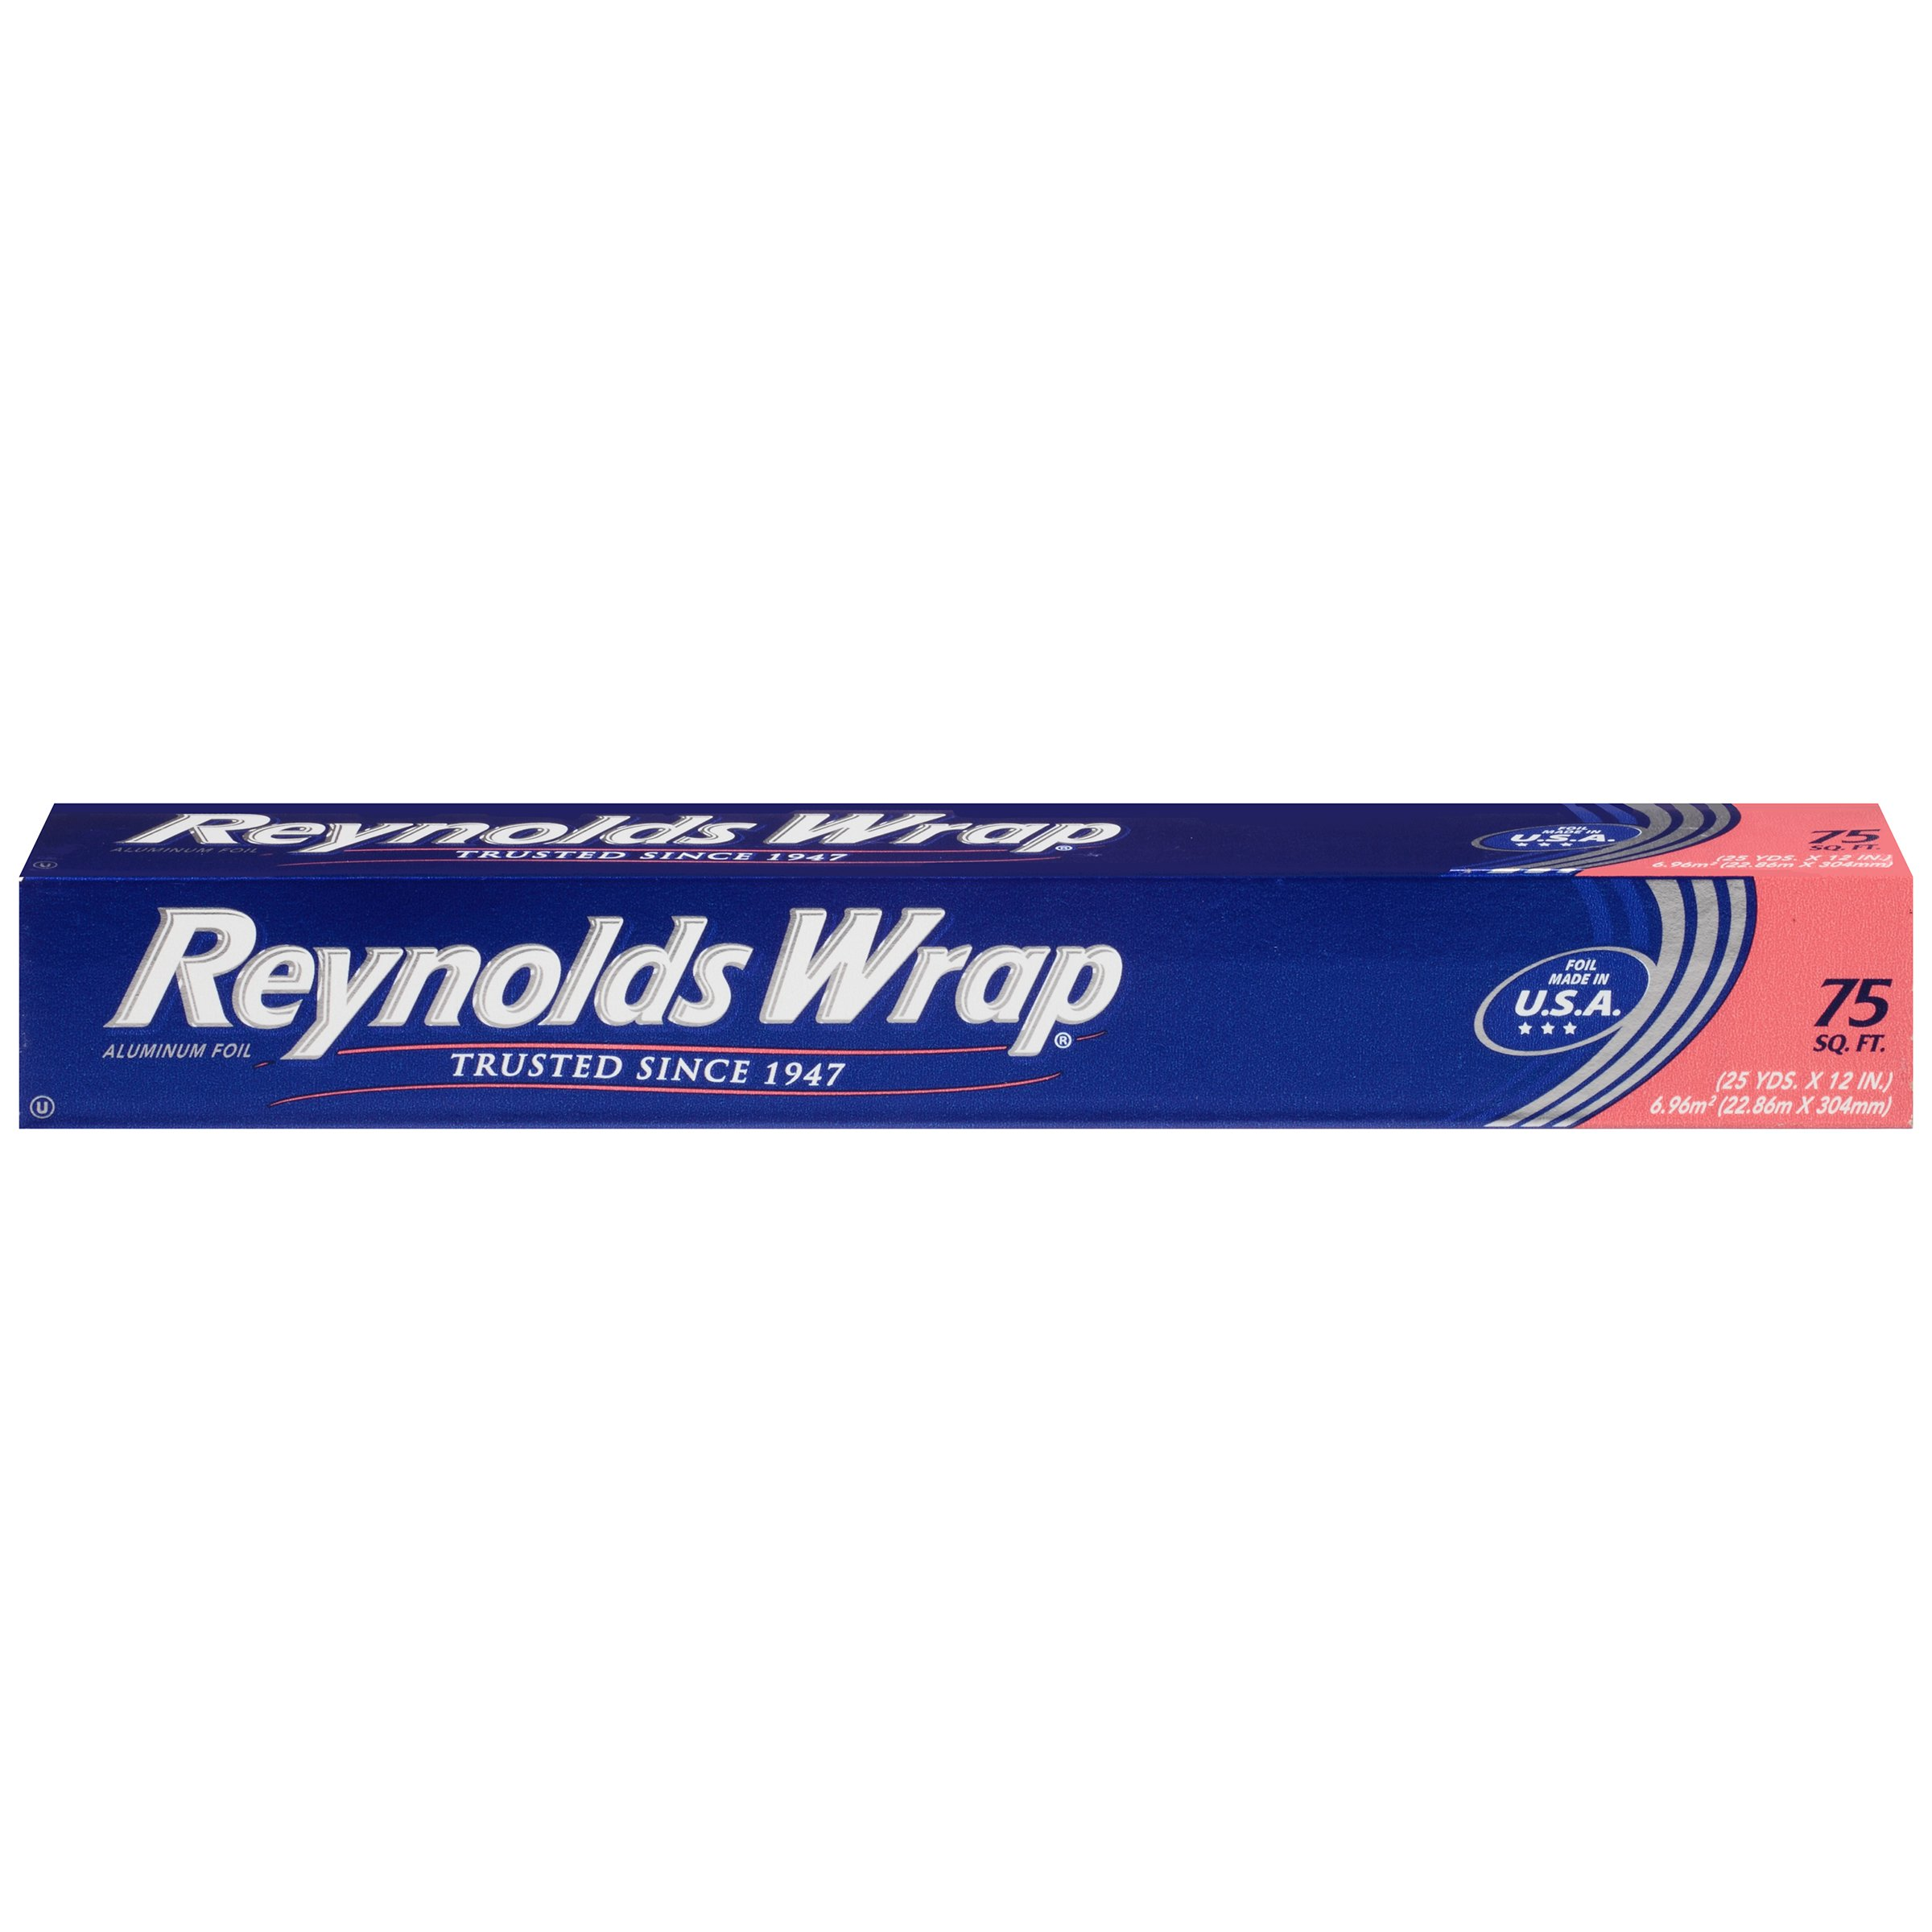 Reynolds Wrap Aluminum Foil (75 Square Foot Roll)